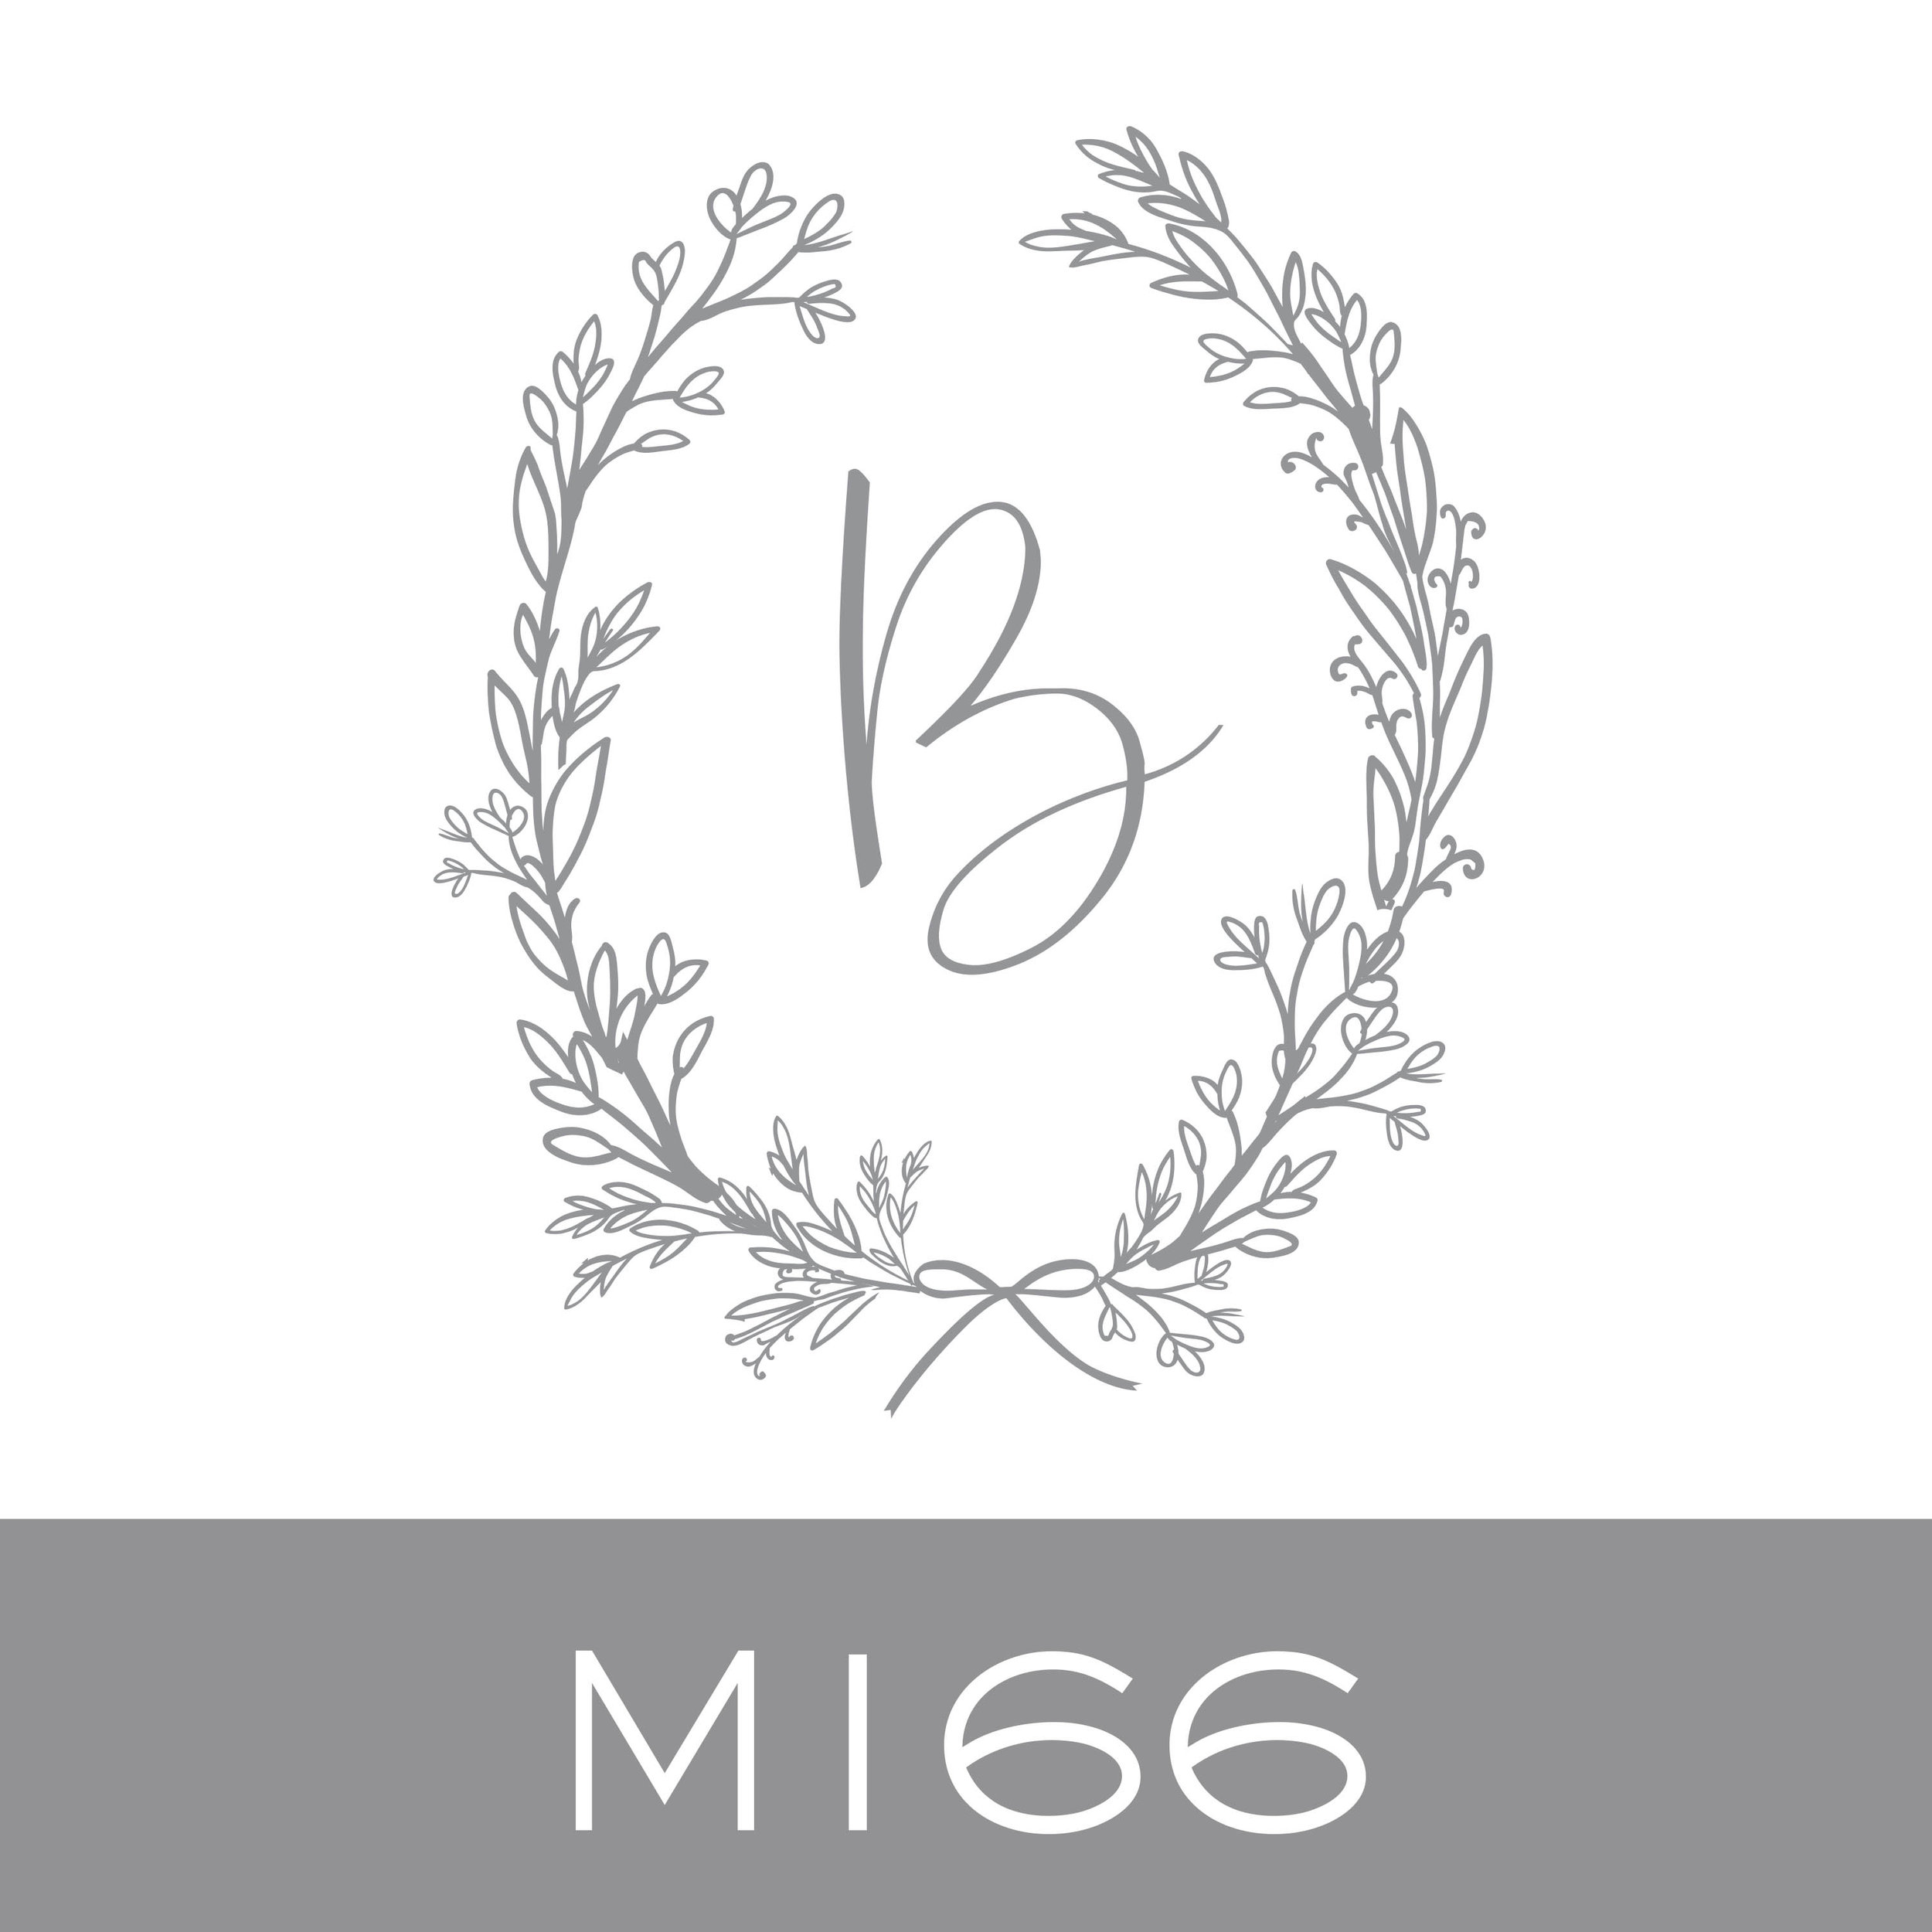 M166.jpg